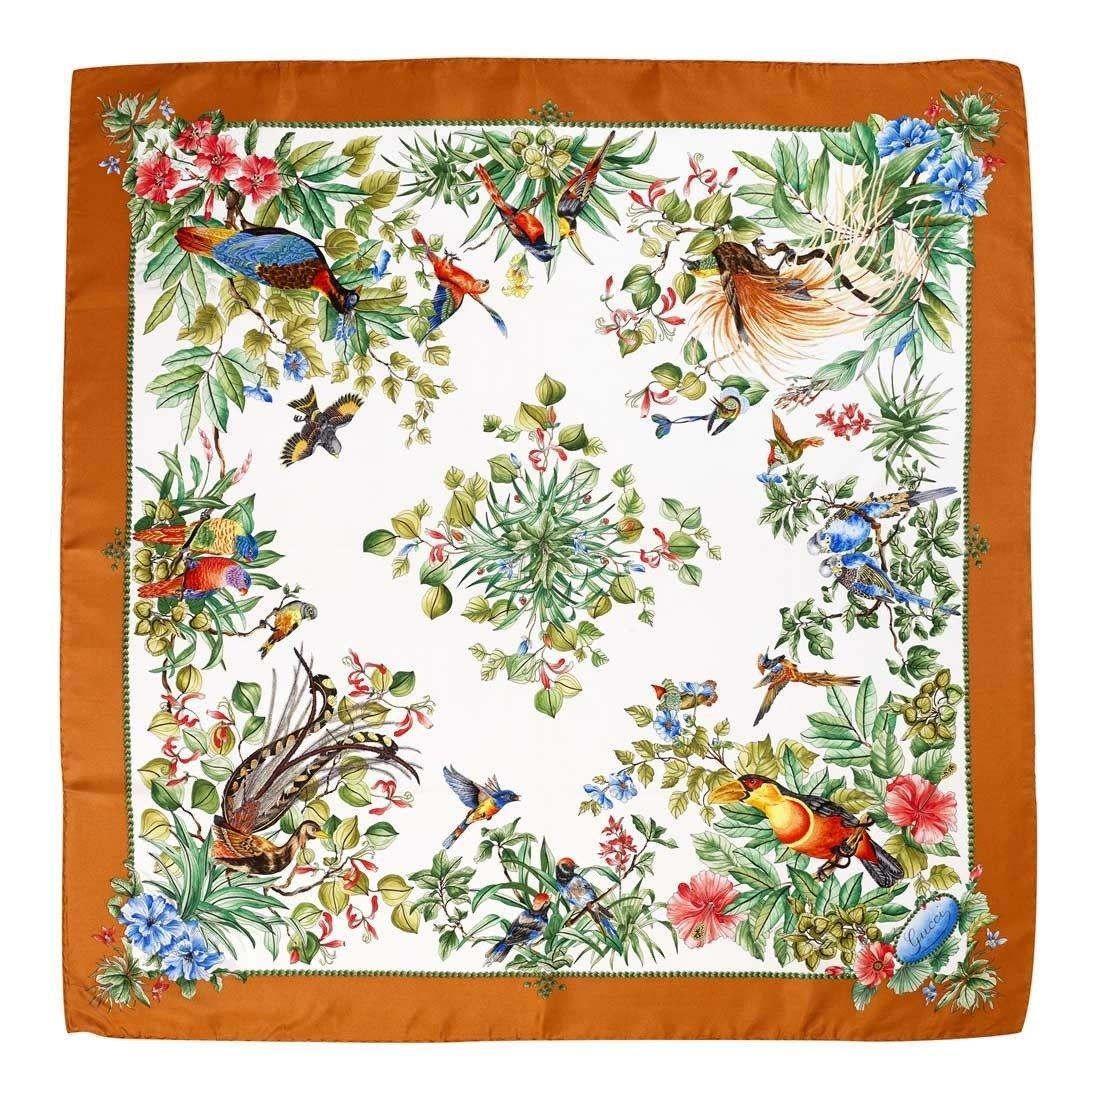 Pin by Lynn Wicks on Scarf | Pinterest | Silk scarves, Scarves and Silk